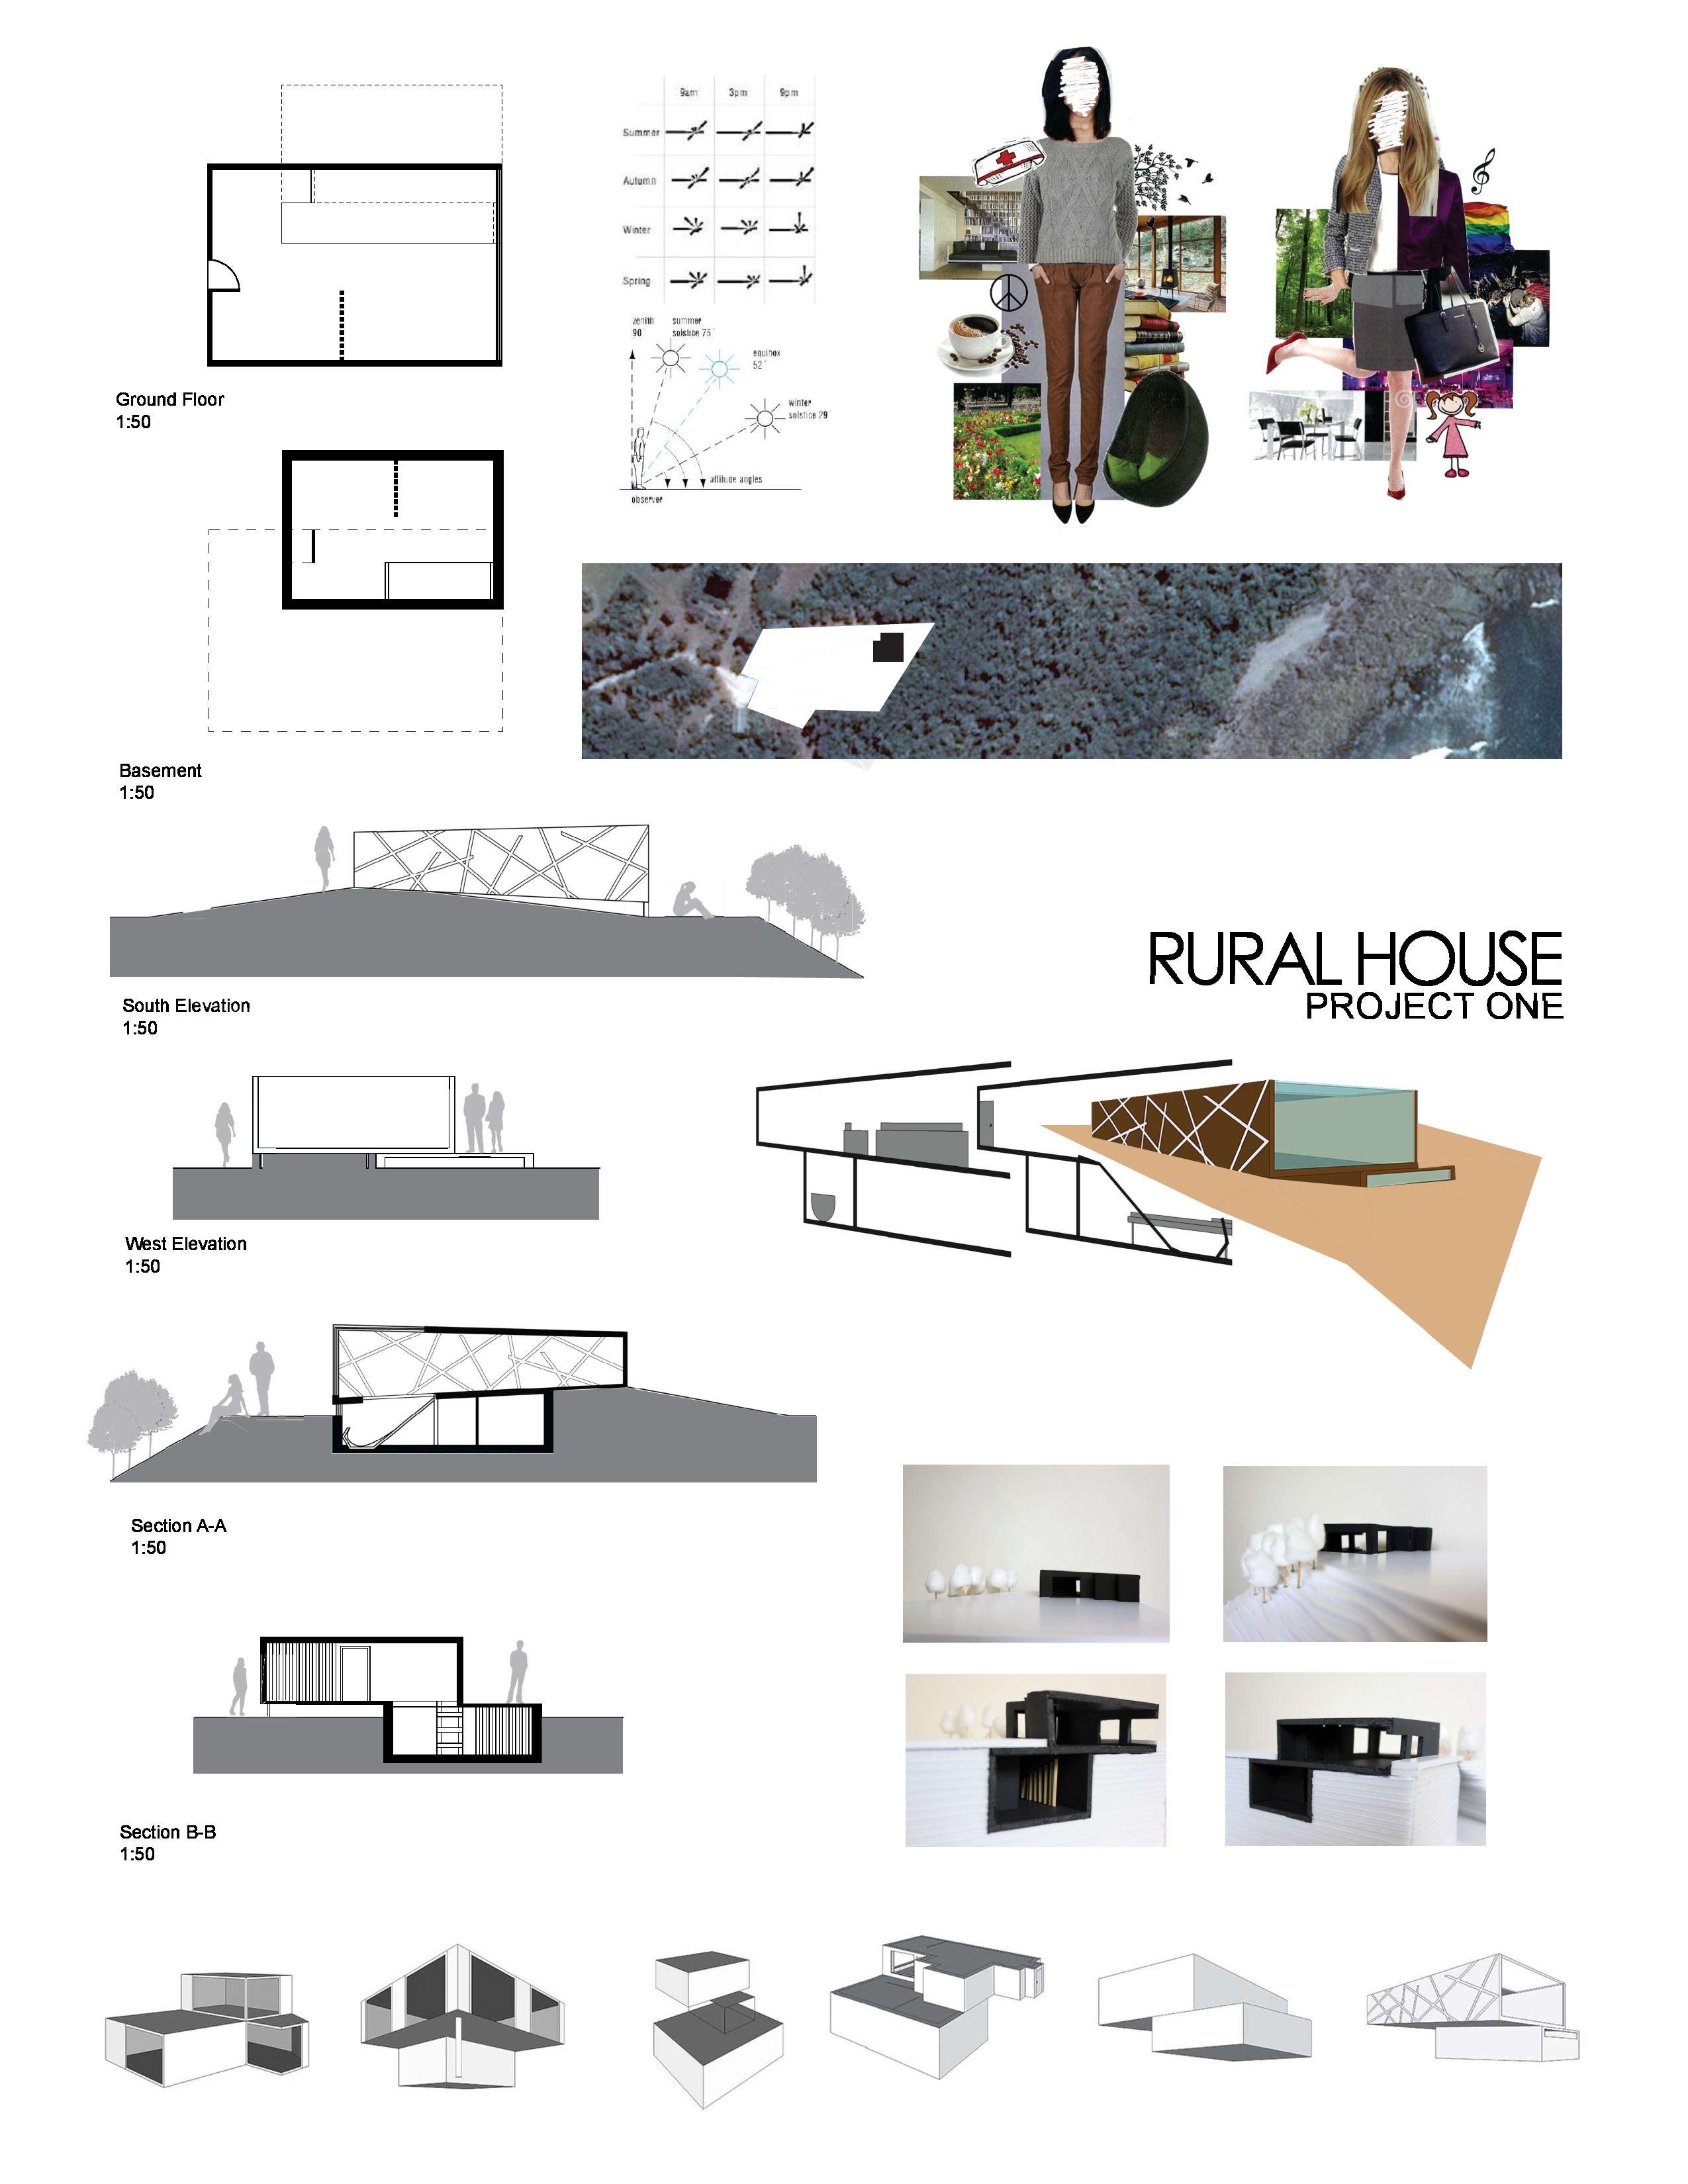 Rural house final presentation Dharmishta Painter - First Year Architecture